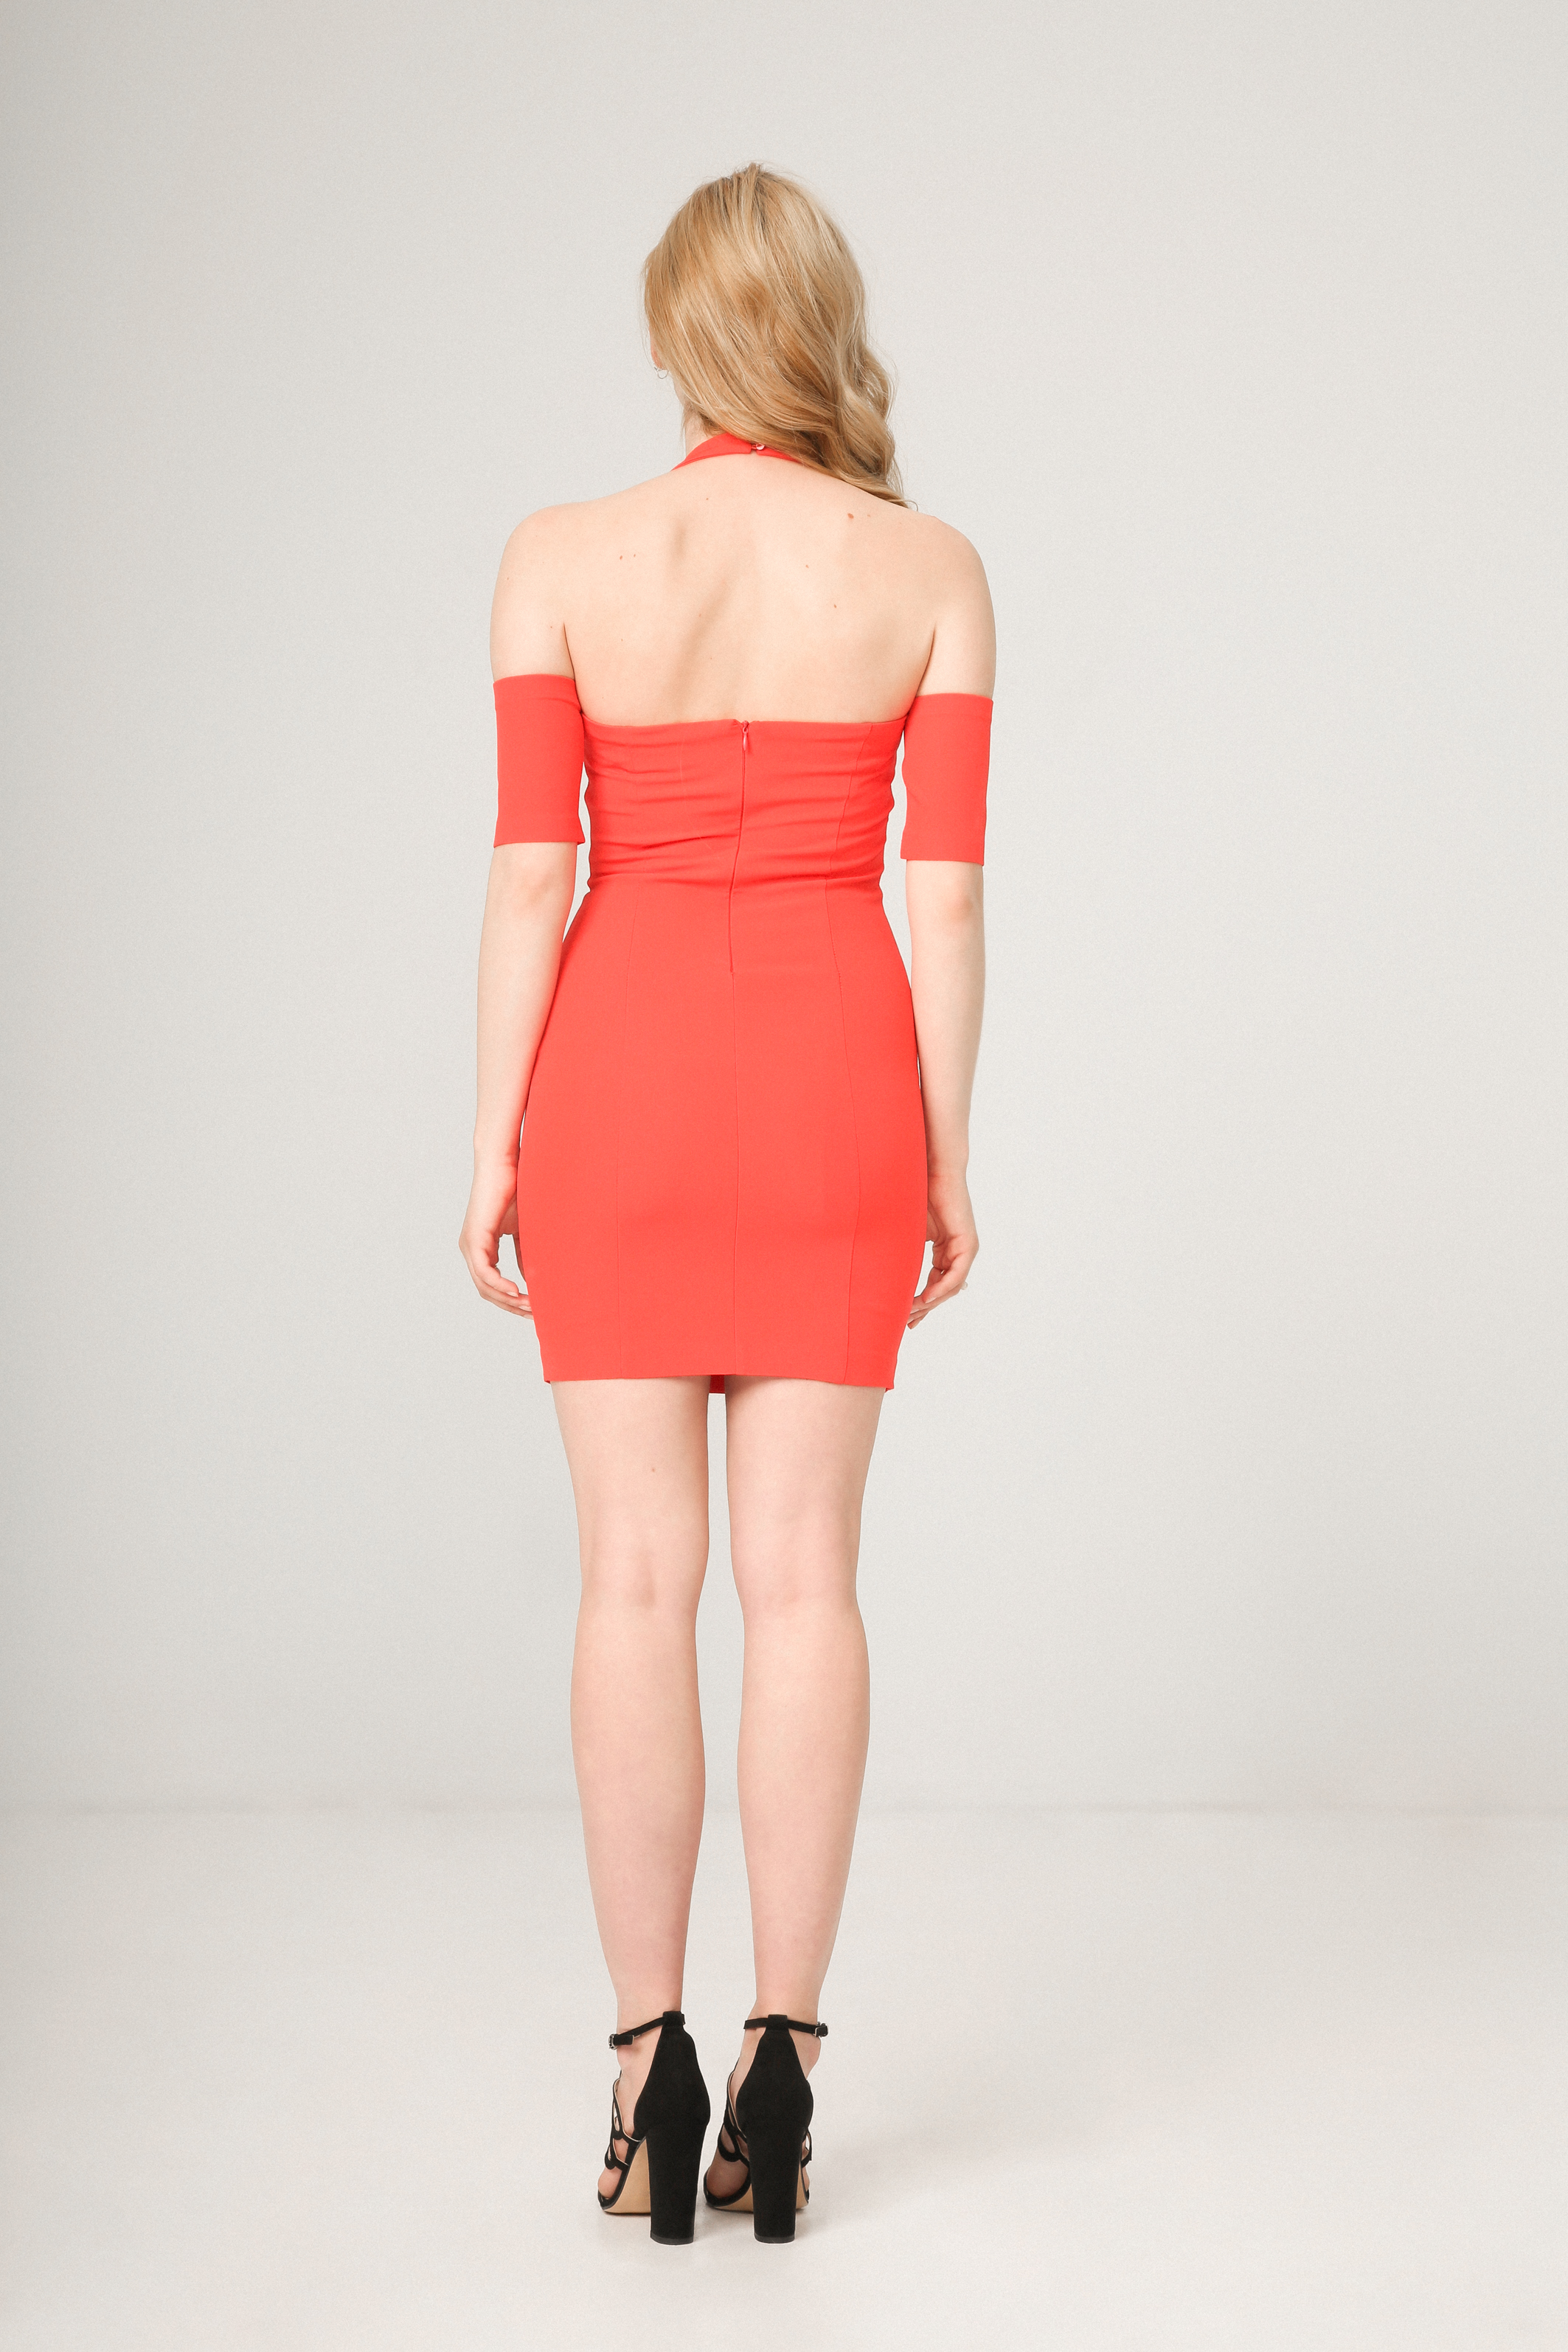 Robes  Fontana 2.0 ZELINDA red